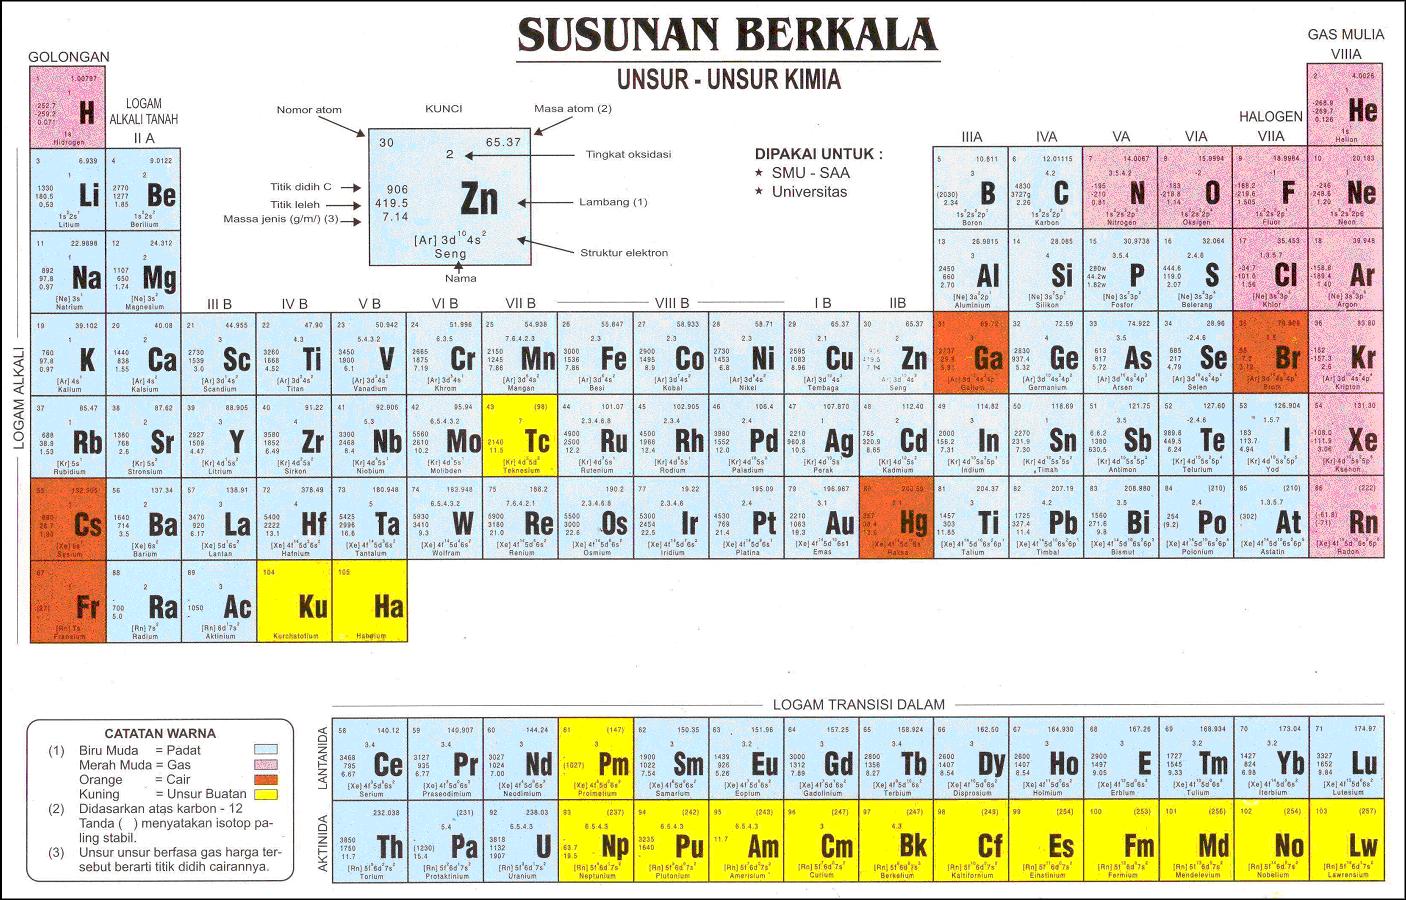 Periodik tabel indonesian periodic tables of the elements michael periodik tabel indonesian periodic tables of the elements michael canov from czech republic urtaz Choice Image